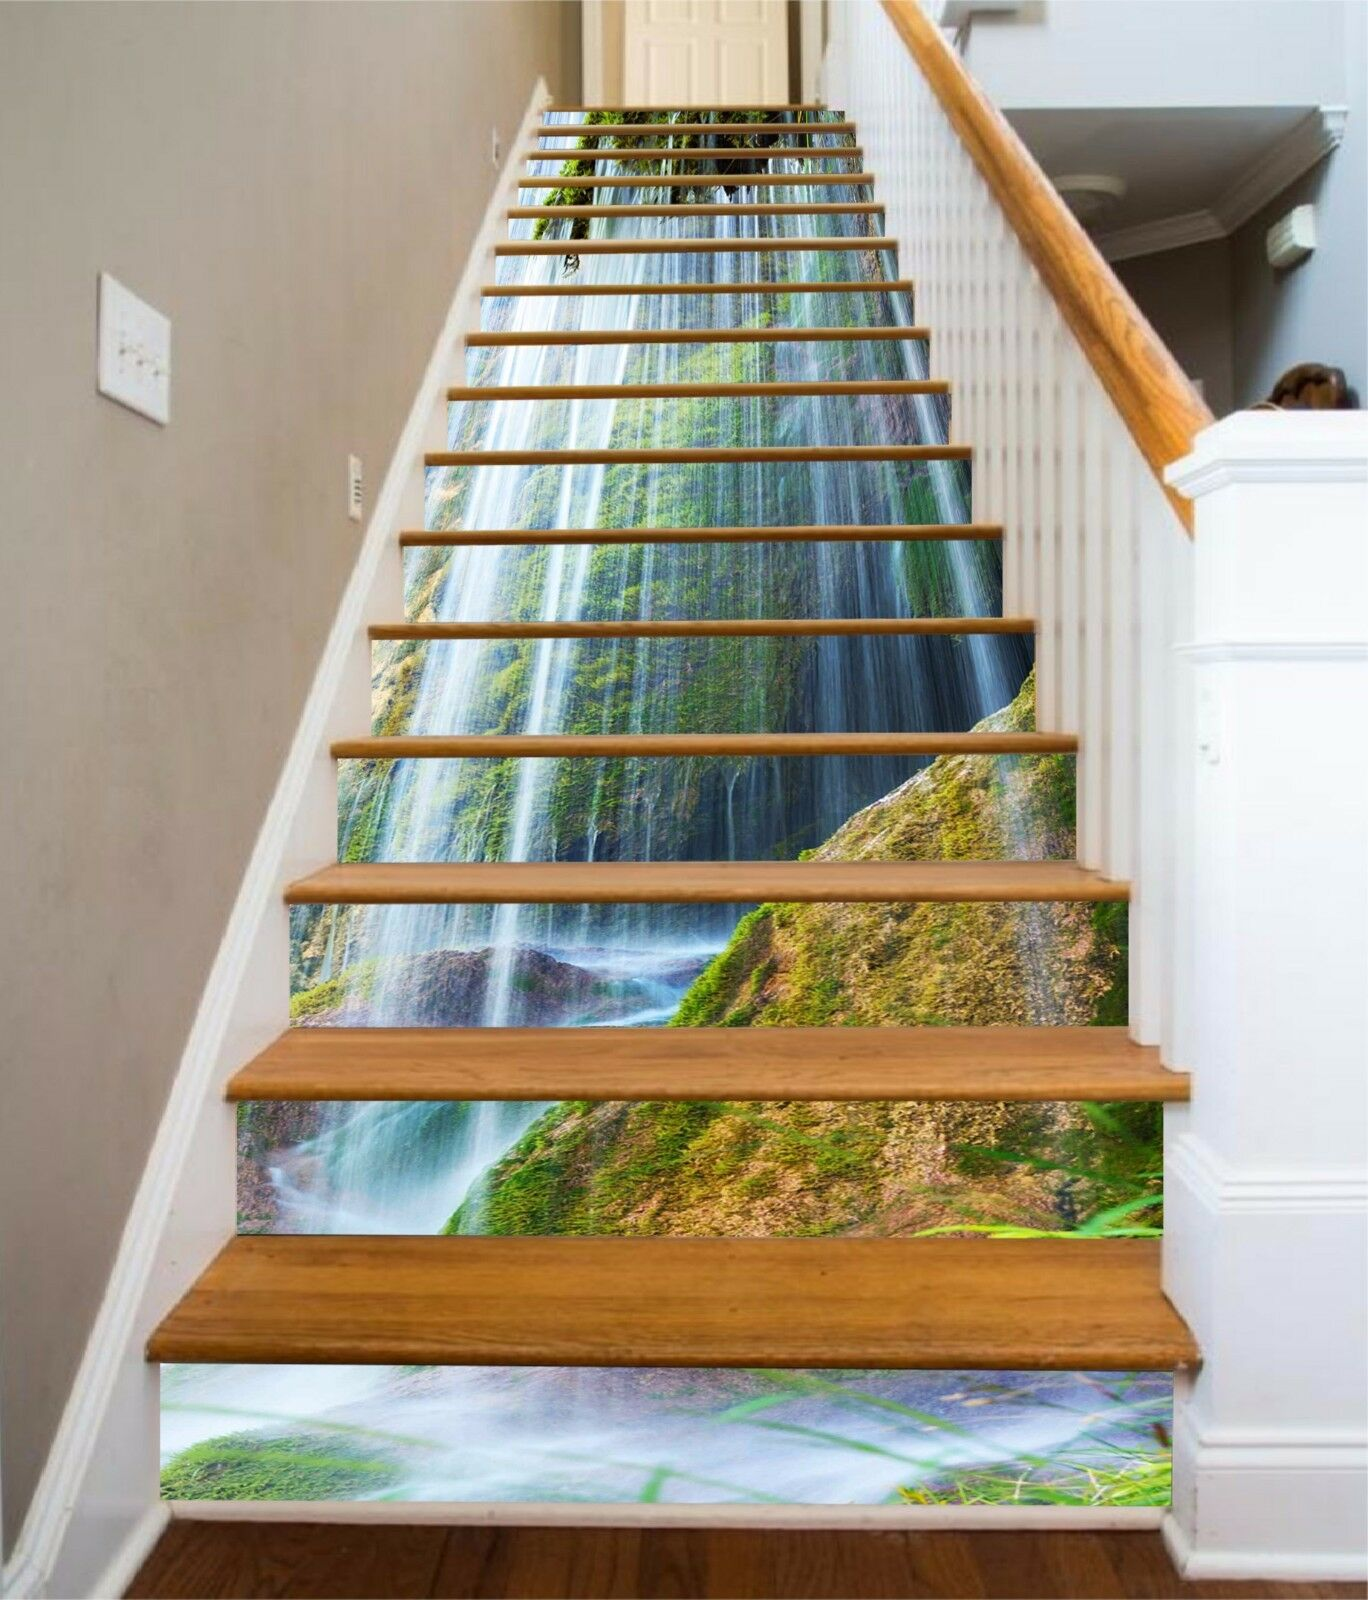 3D Stone Falls 8432 Stair Risers Decoration Photo Mural Vinyl Decal WandPapier AU